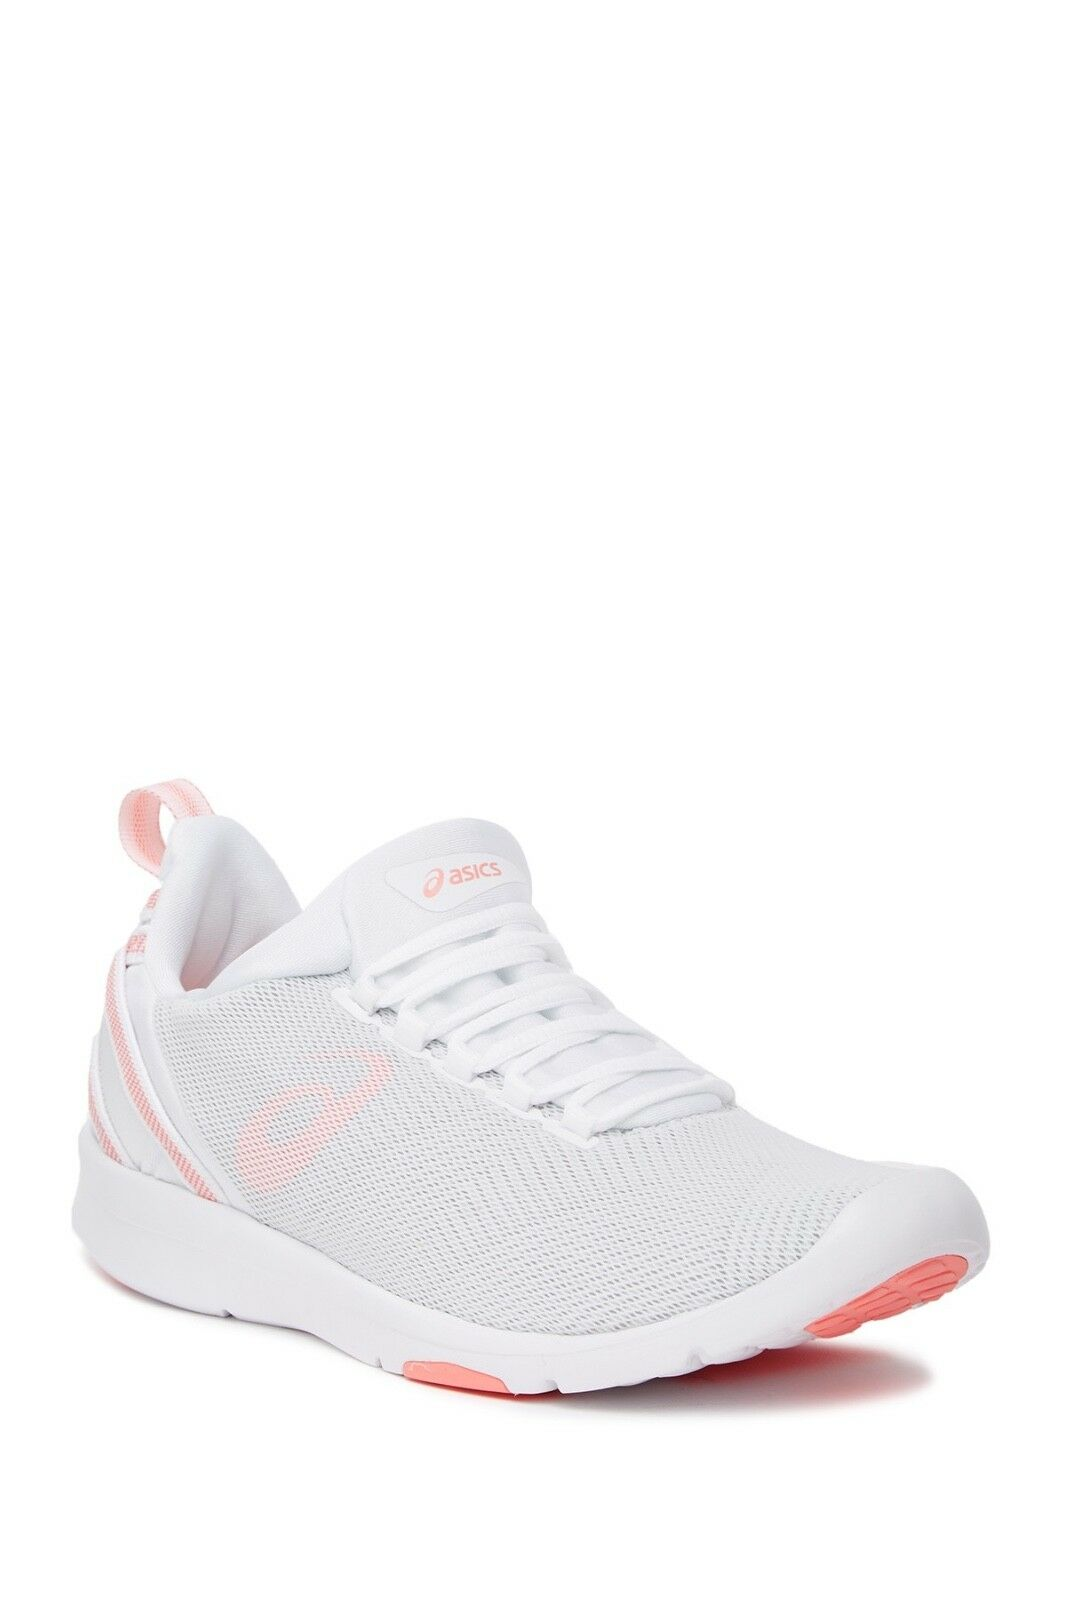 Asics Gel-Fit Sana 3 Cross Training Sneaker White/Begonia Pink/Glacier Grey NIB Cheap women's shoes women's shoes